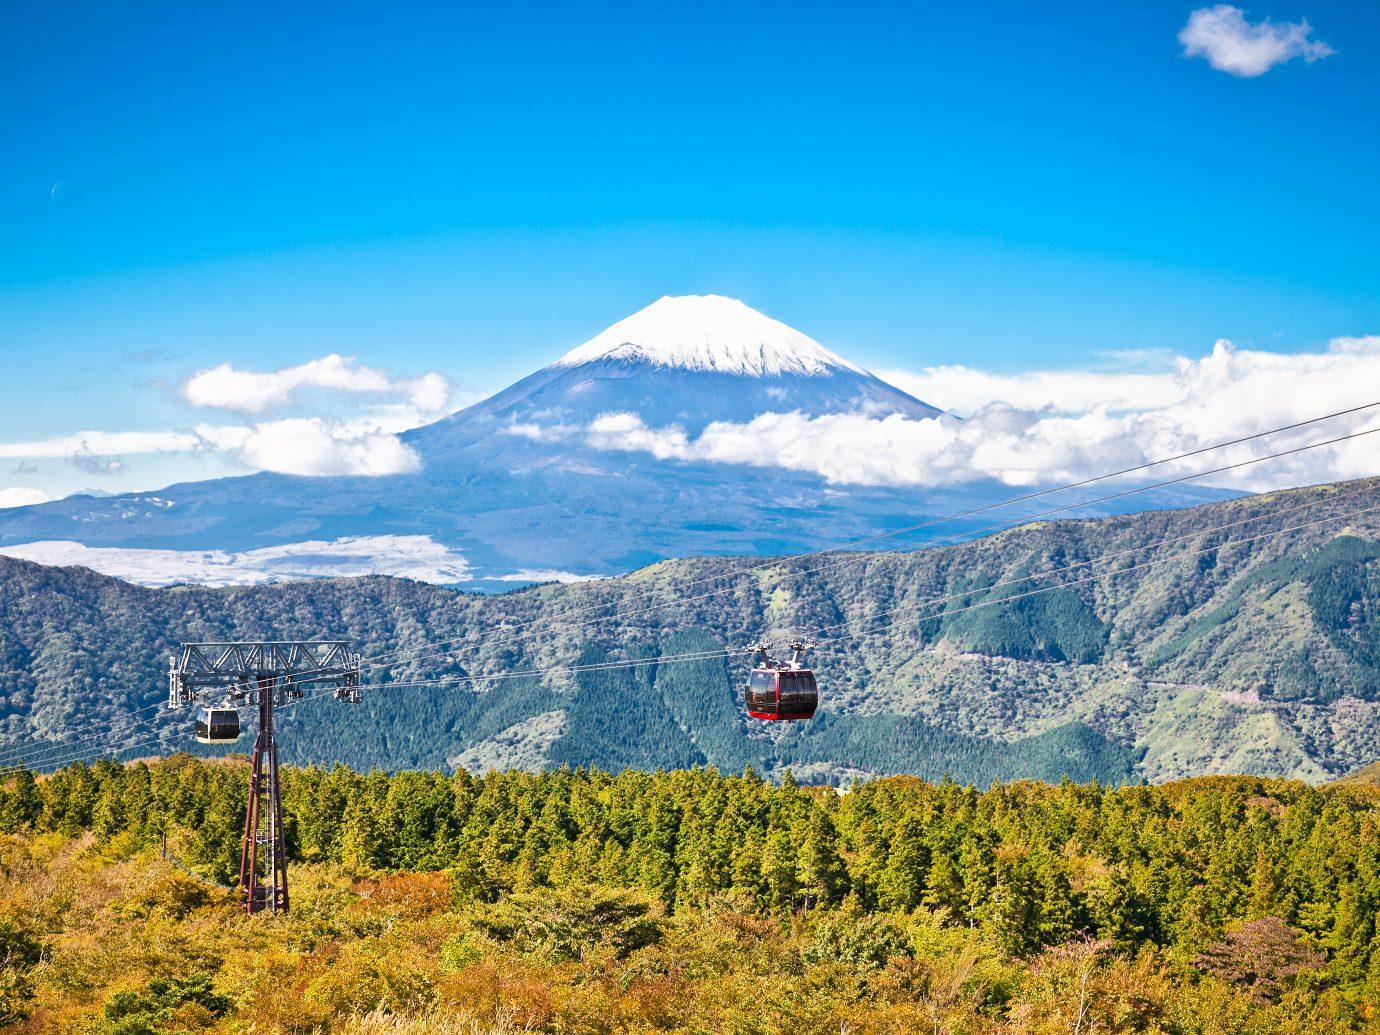 Ropeway and view of Mountain Fuji from Owakudani, Hakone. Japan.